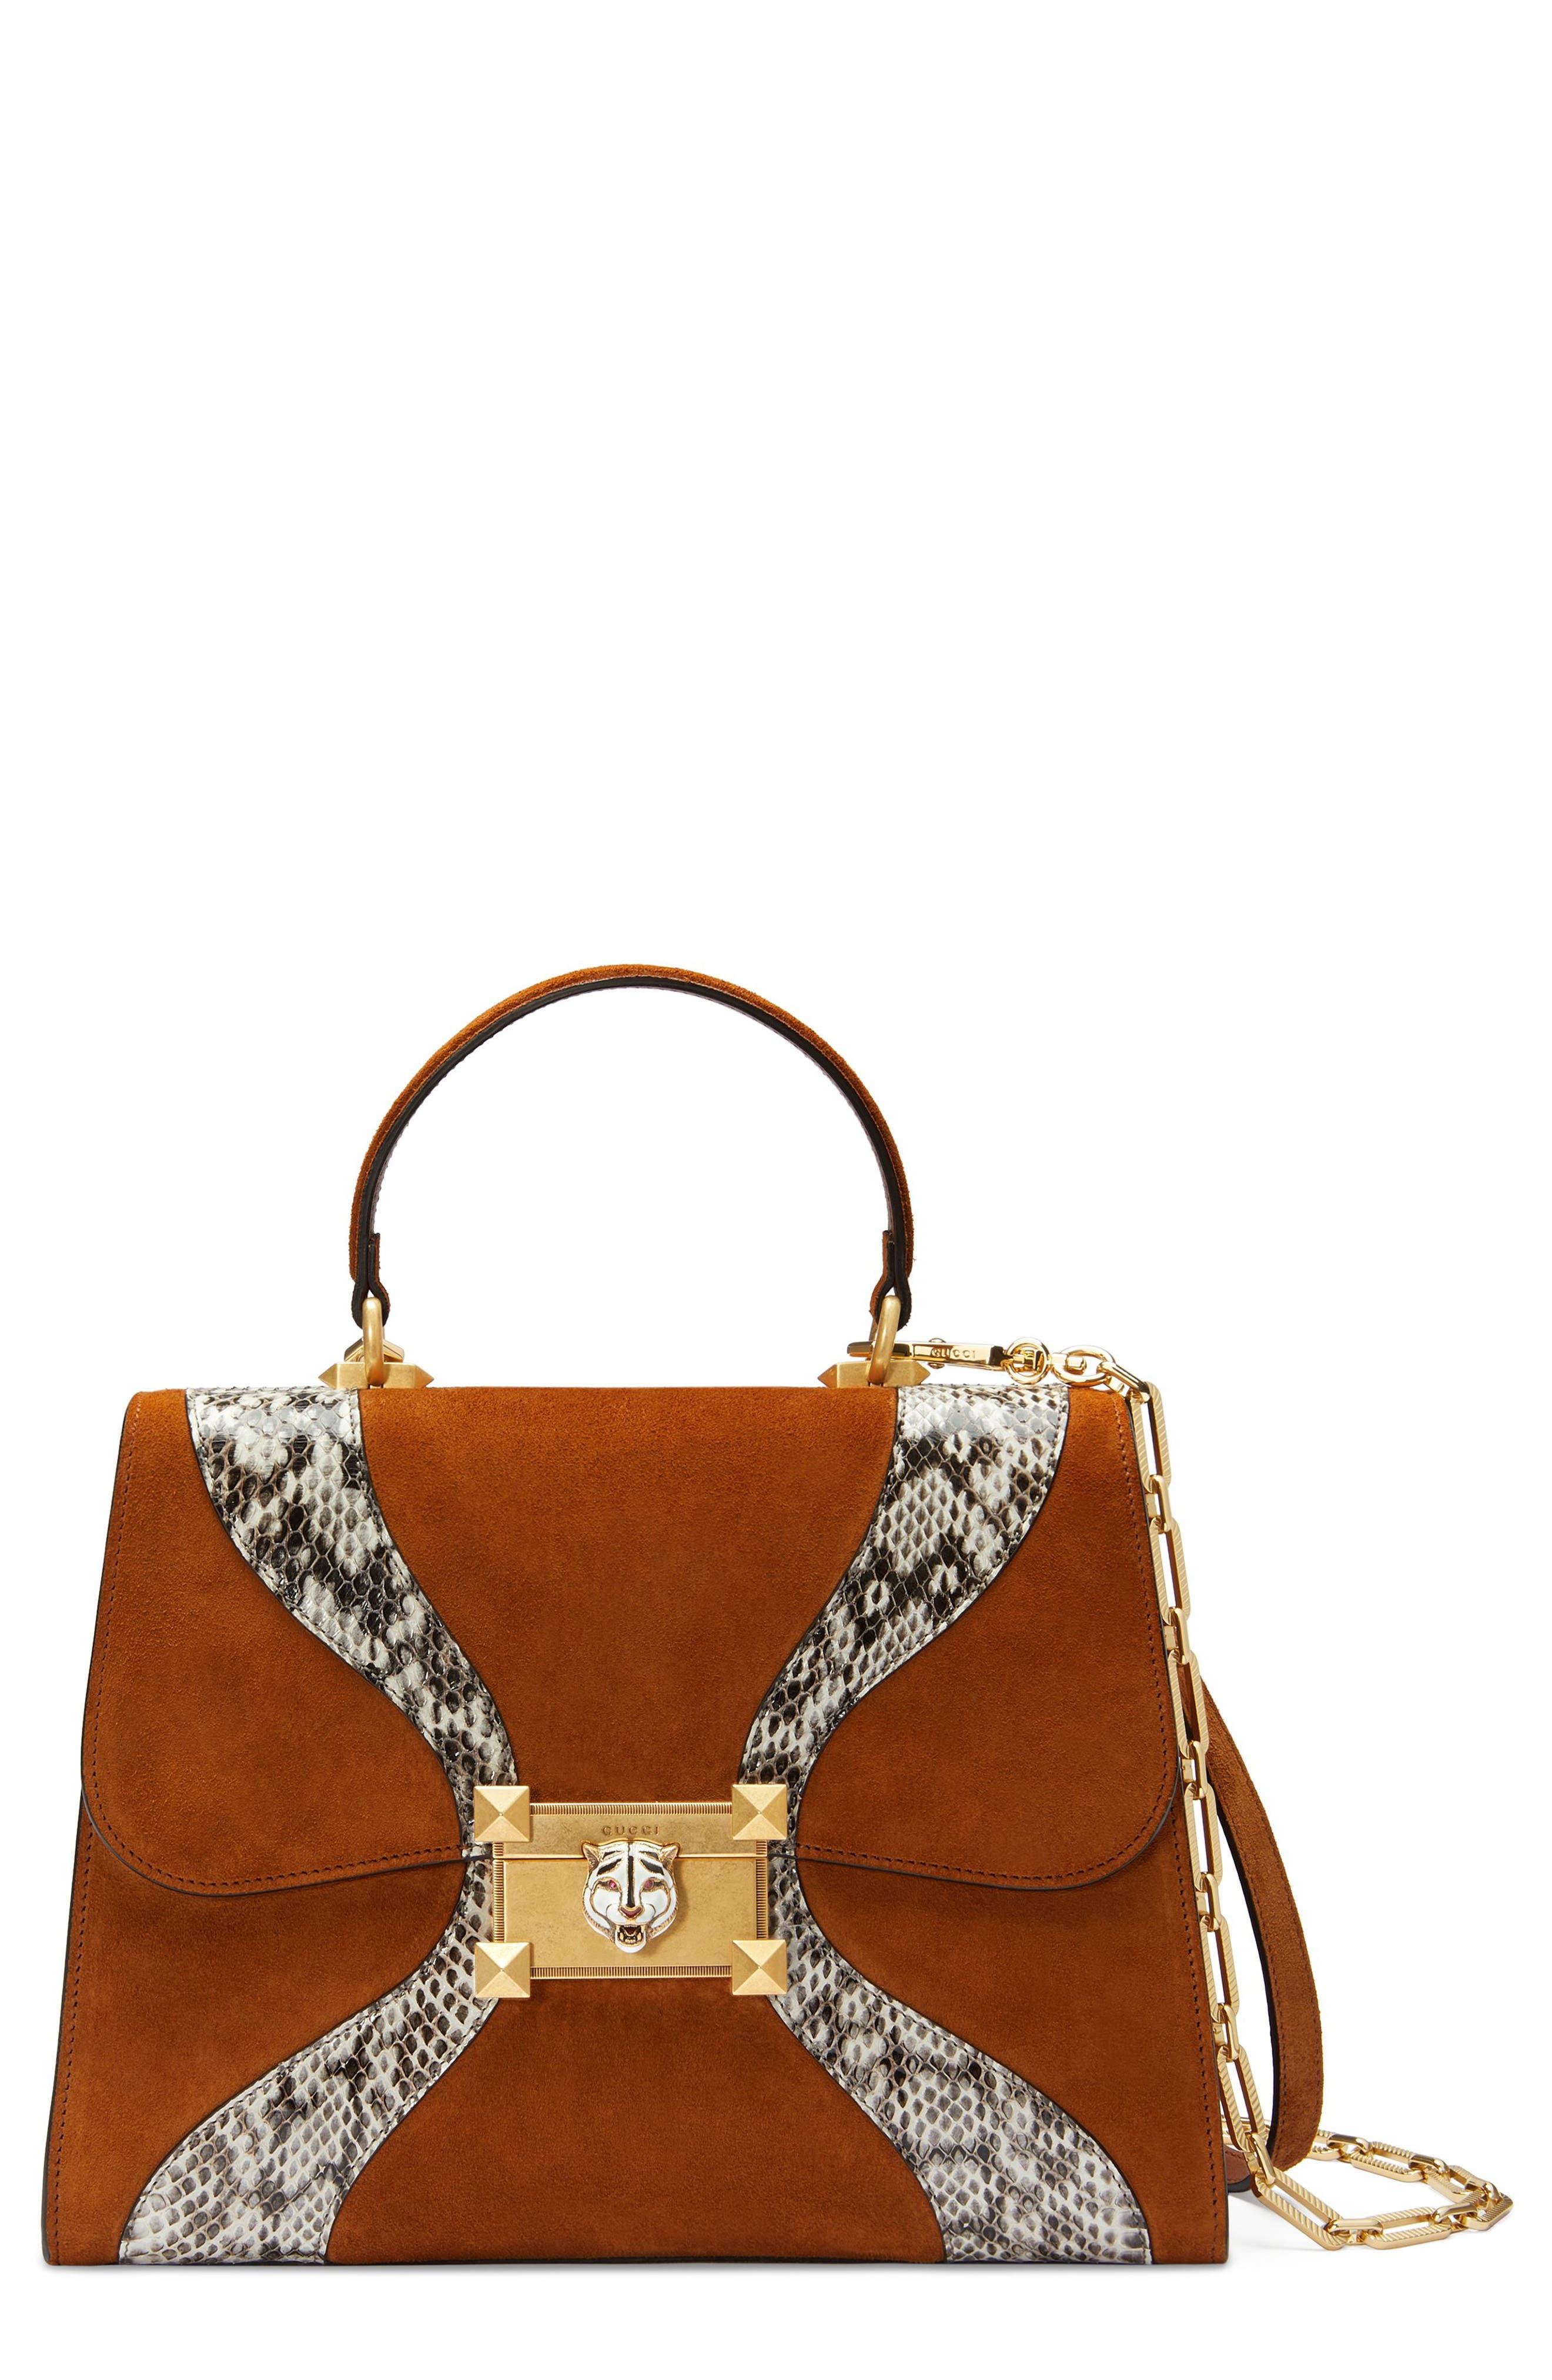 Small Osiride Leather & Canvas Top Handle Satchel,                             Main thumbnail 1, color,                             Bright Cuir/ Roccia